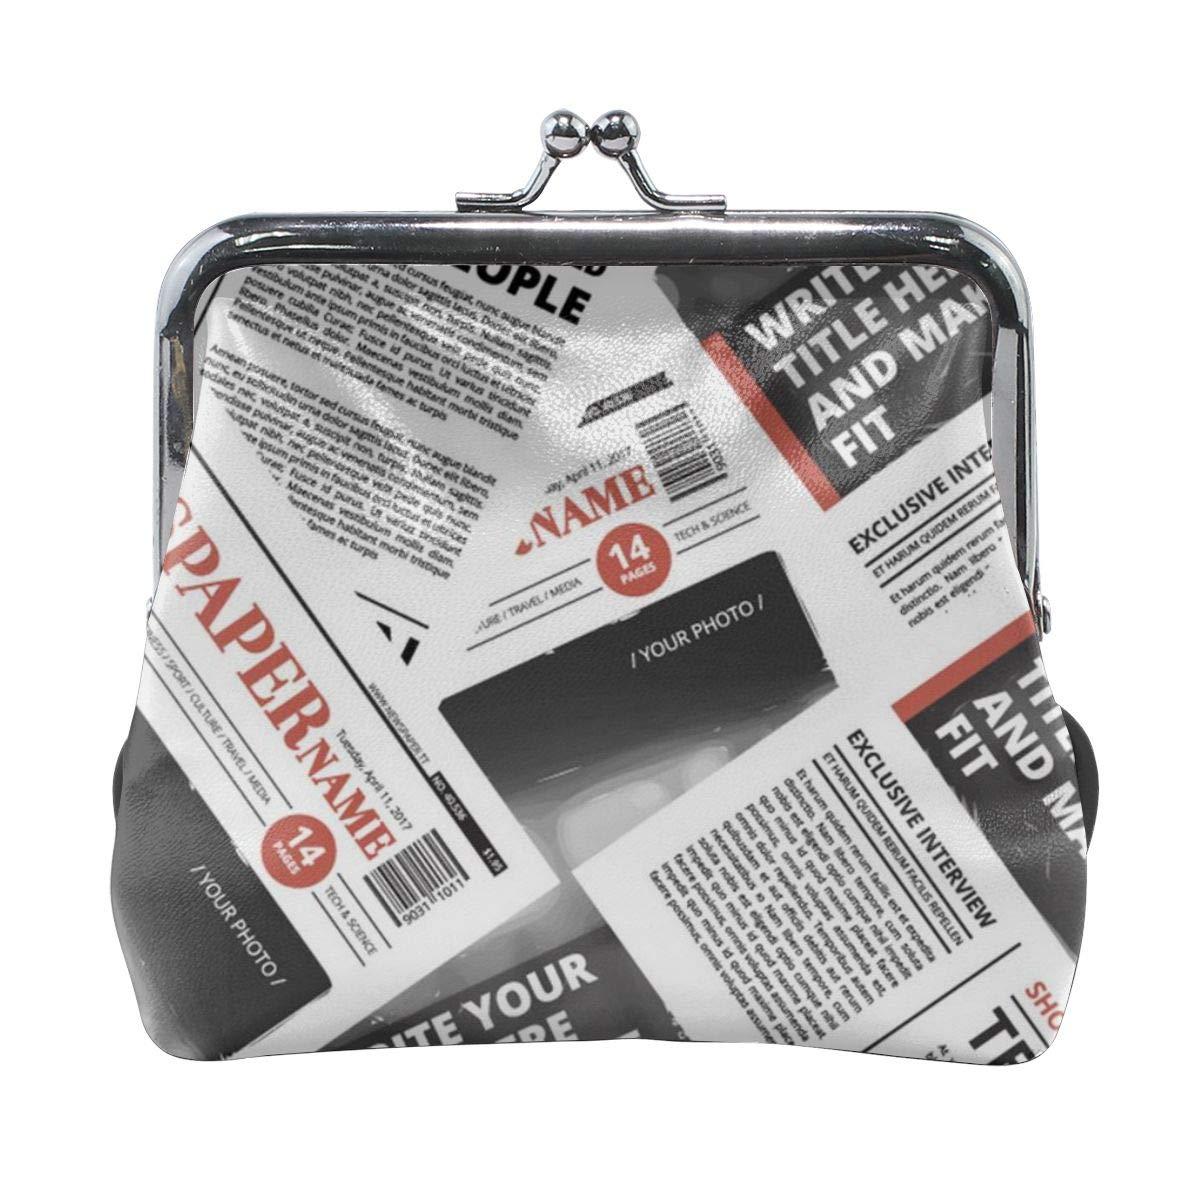 Newspaper Print Cute Buckle Coin Purses Buckle Buckle Change Purse Wallets